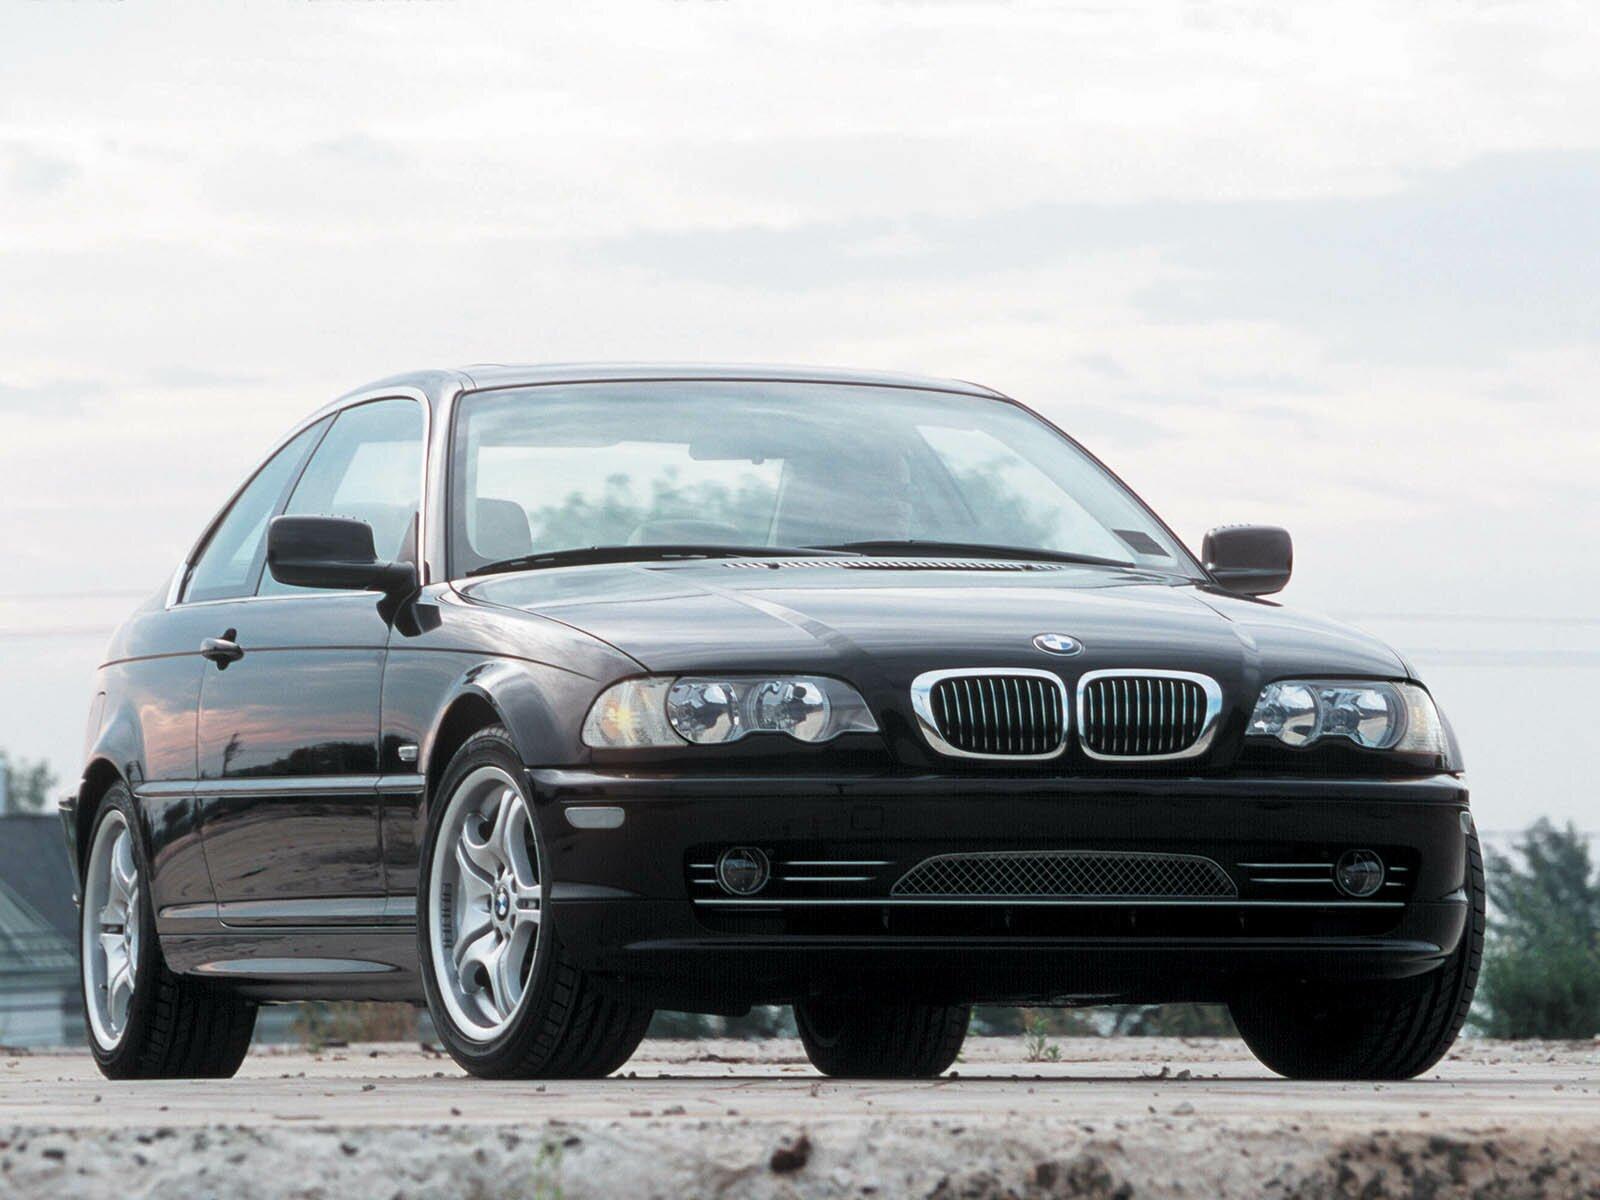 BMW 3 Series Coupe (E46) specs & photos - 1999, 2000, 2001, 2002